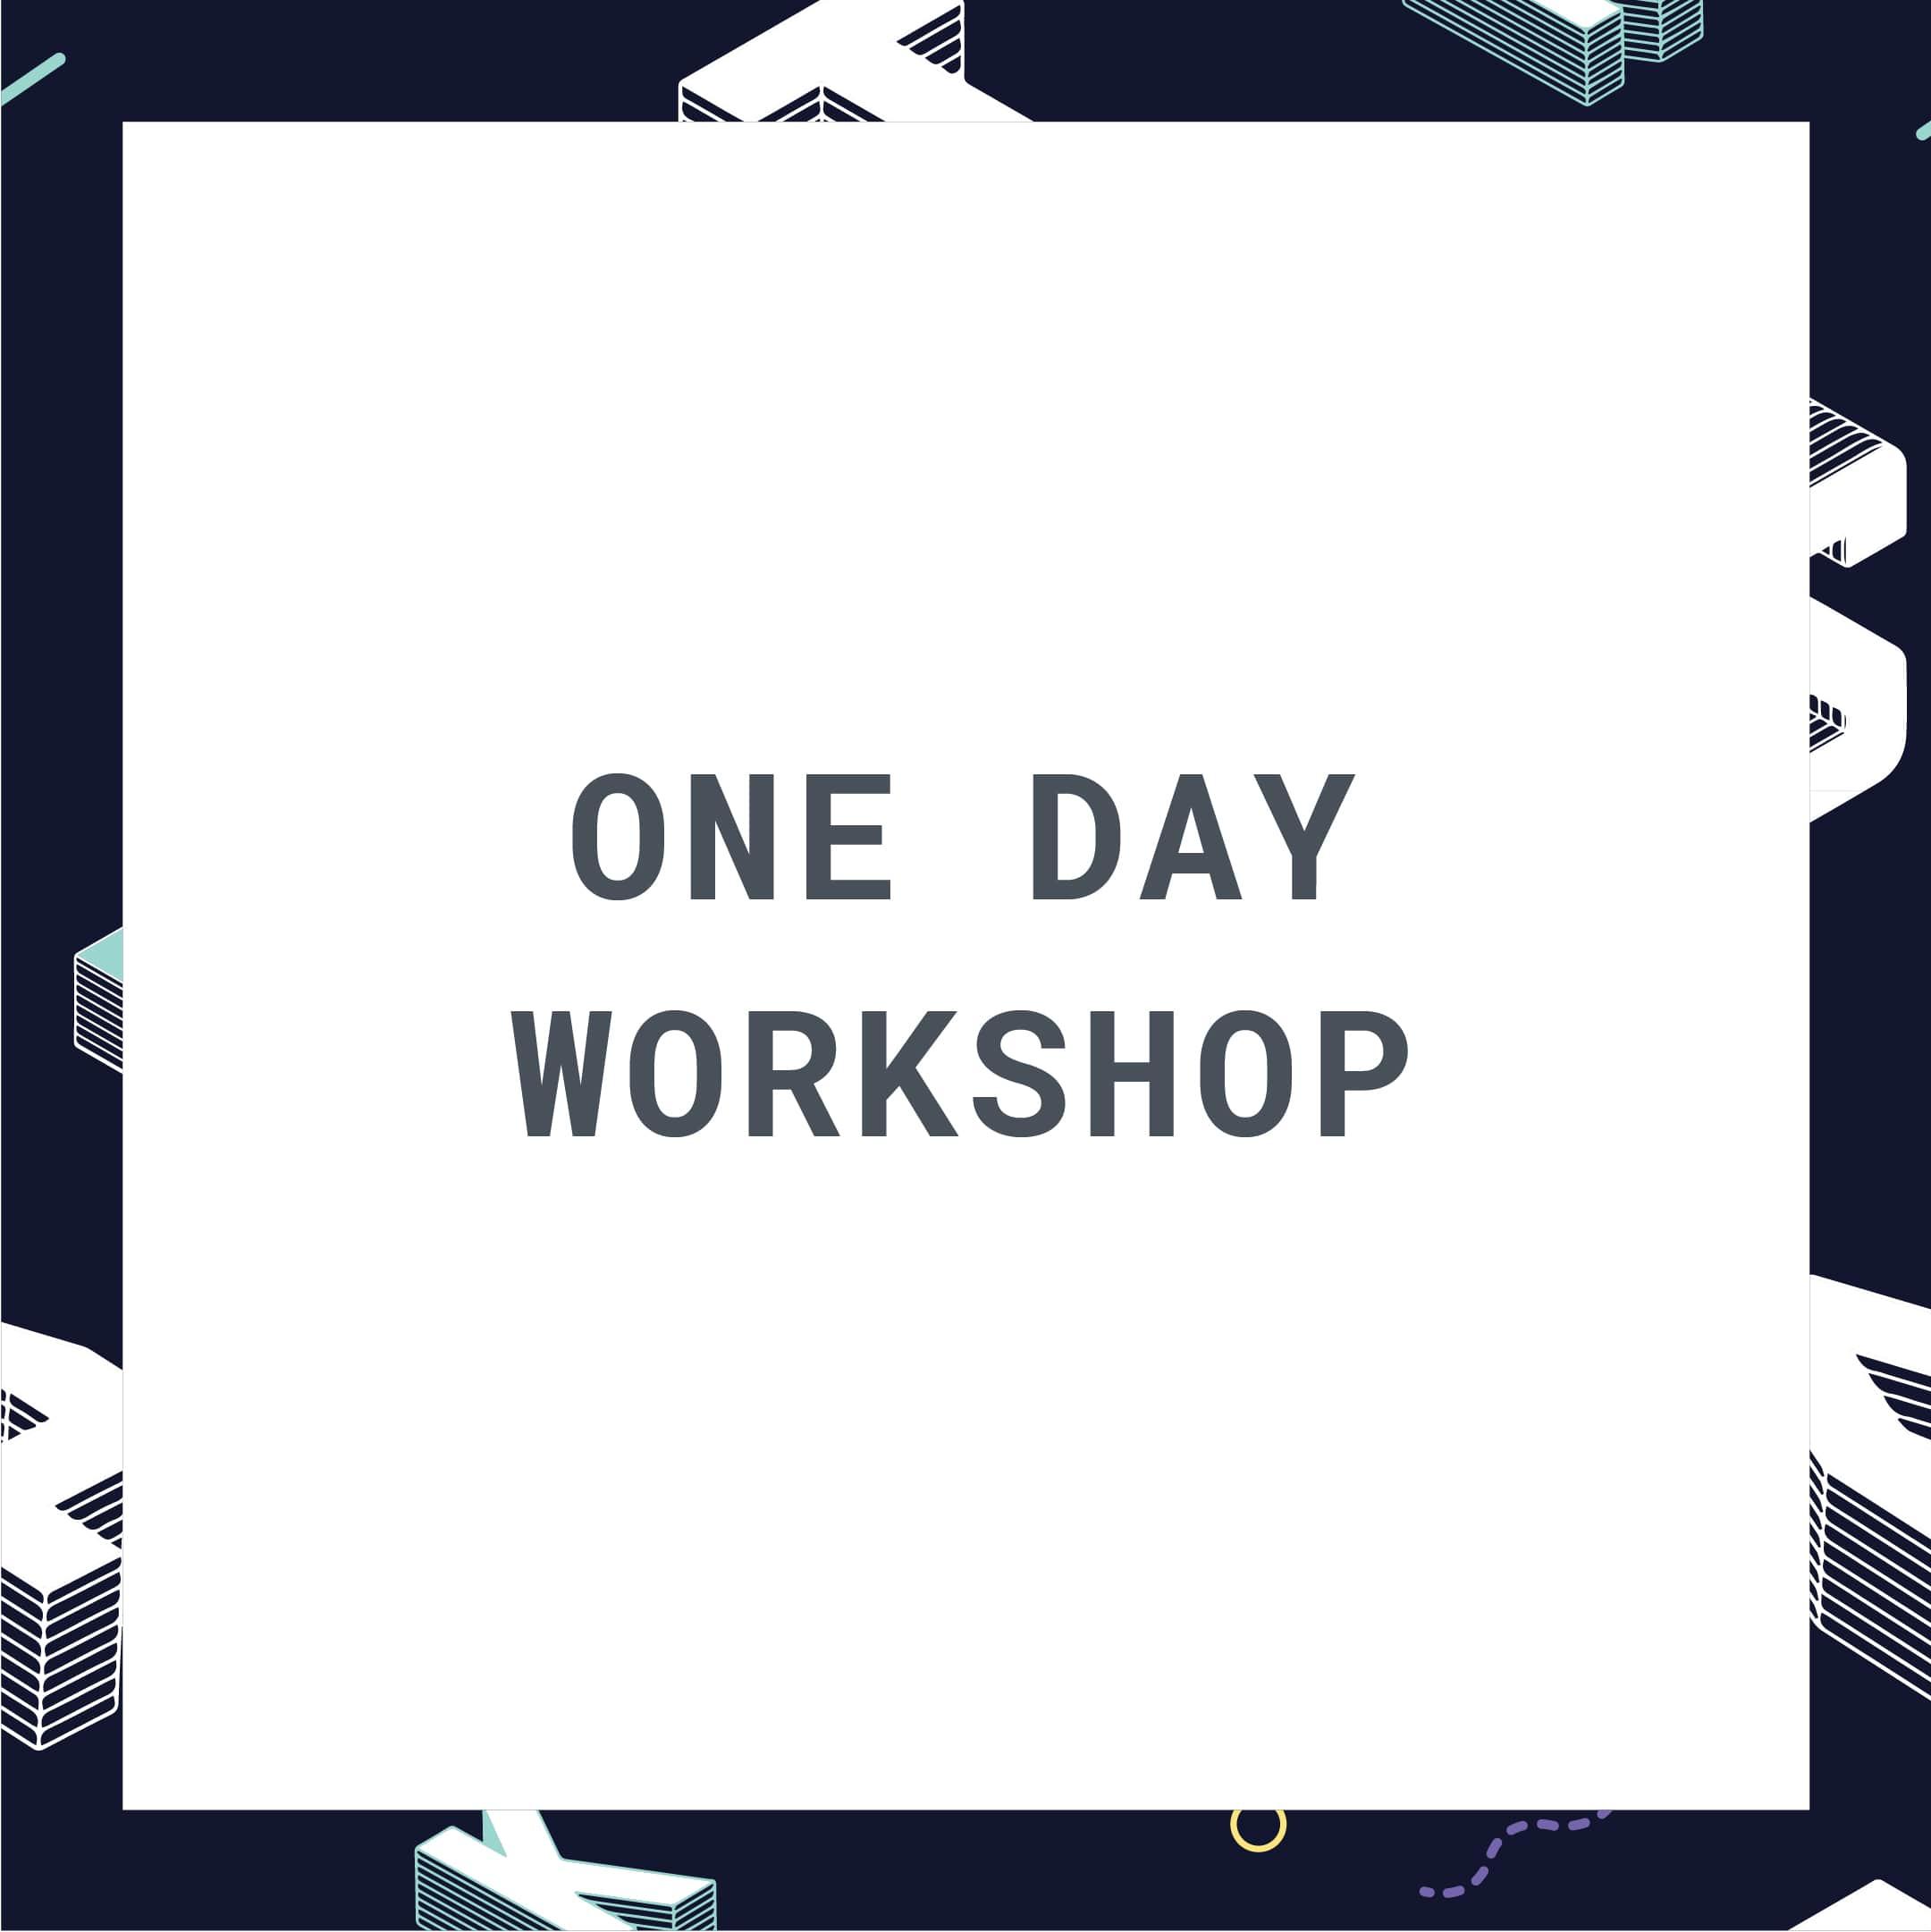 One day workshop-min.jpg